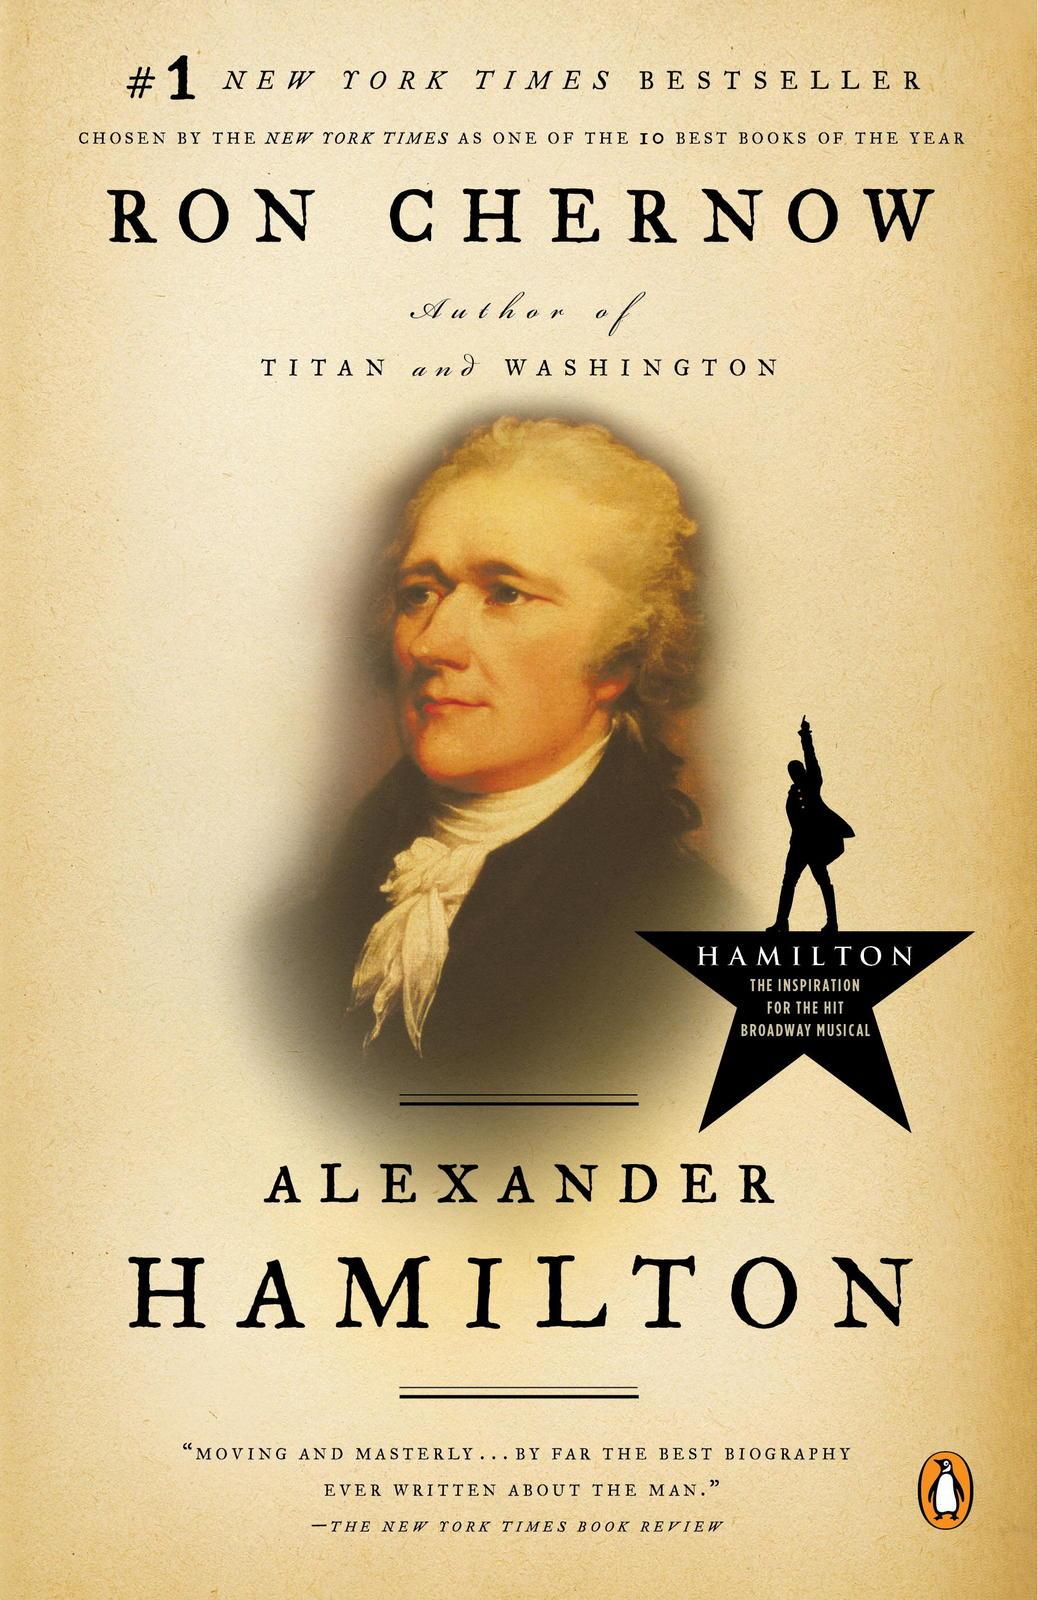 Alexander Hamilton by Ron Chernow image